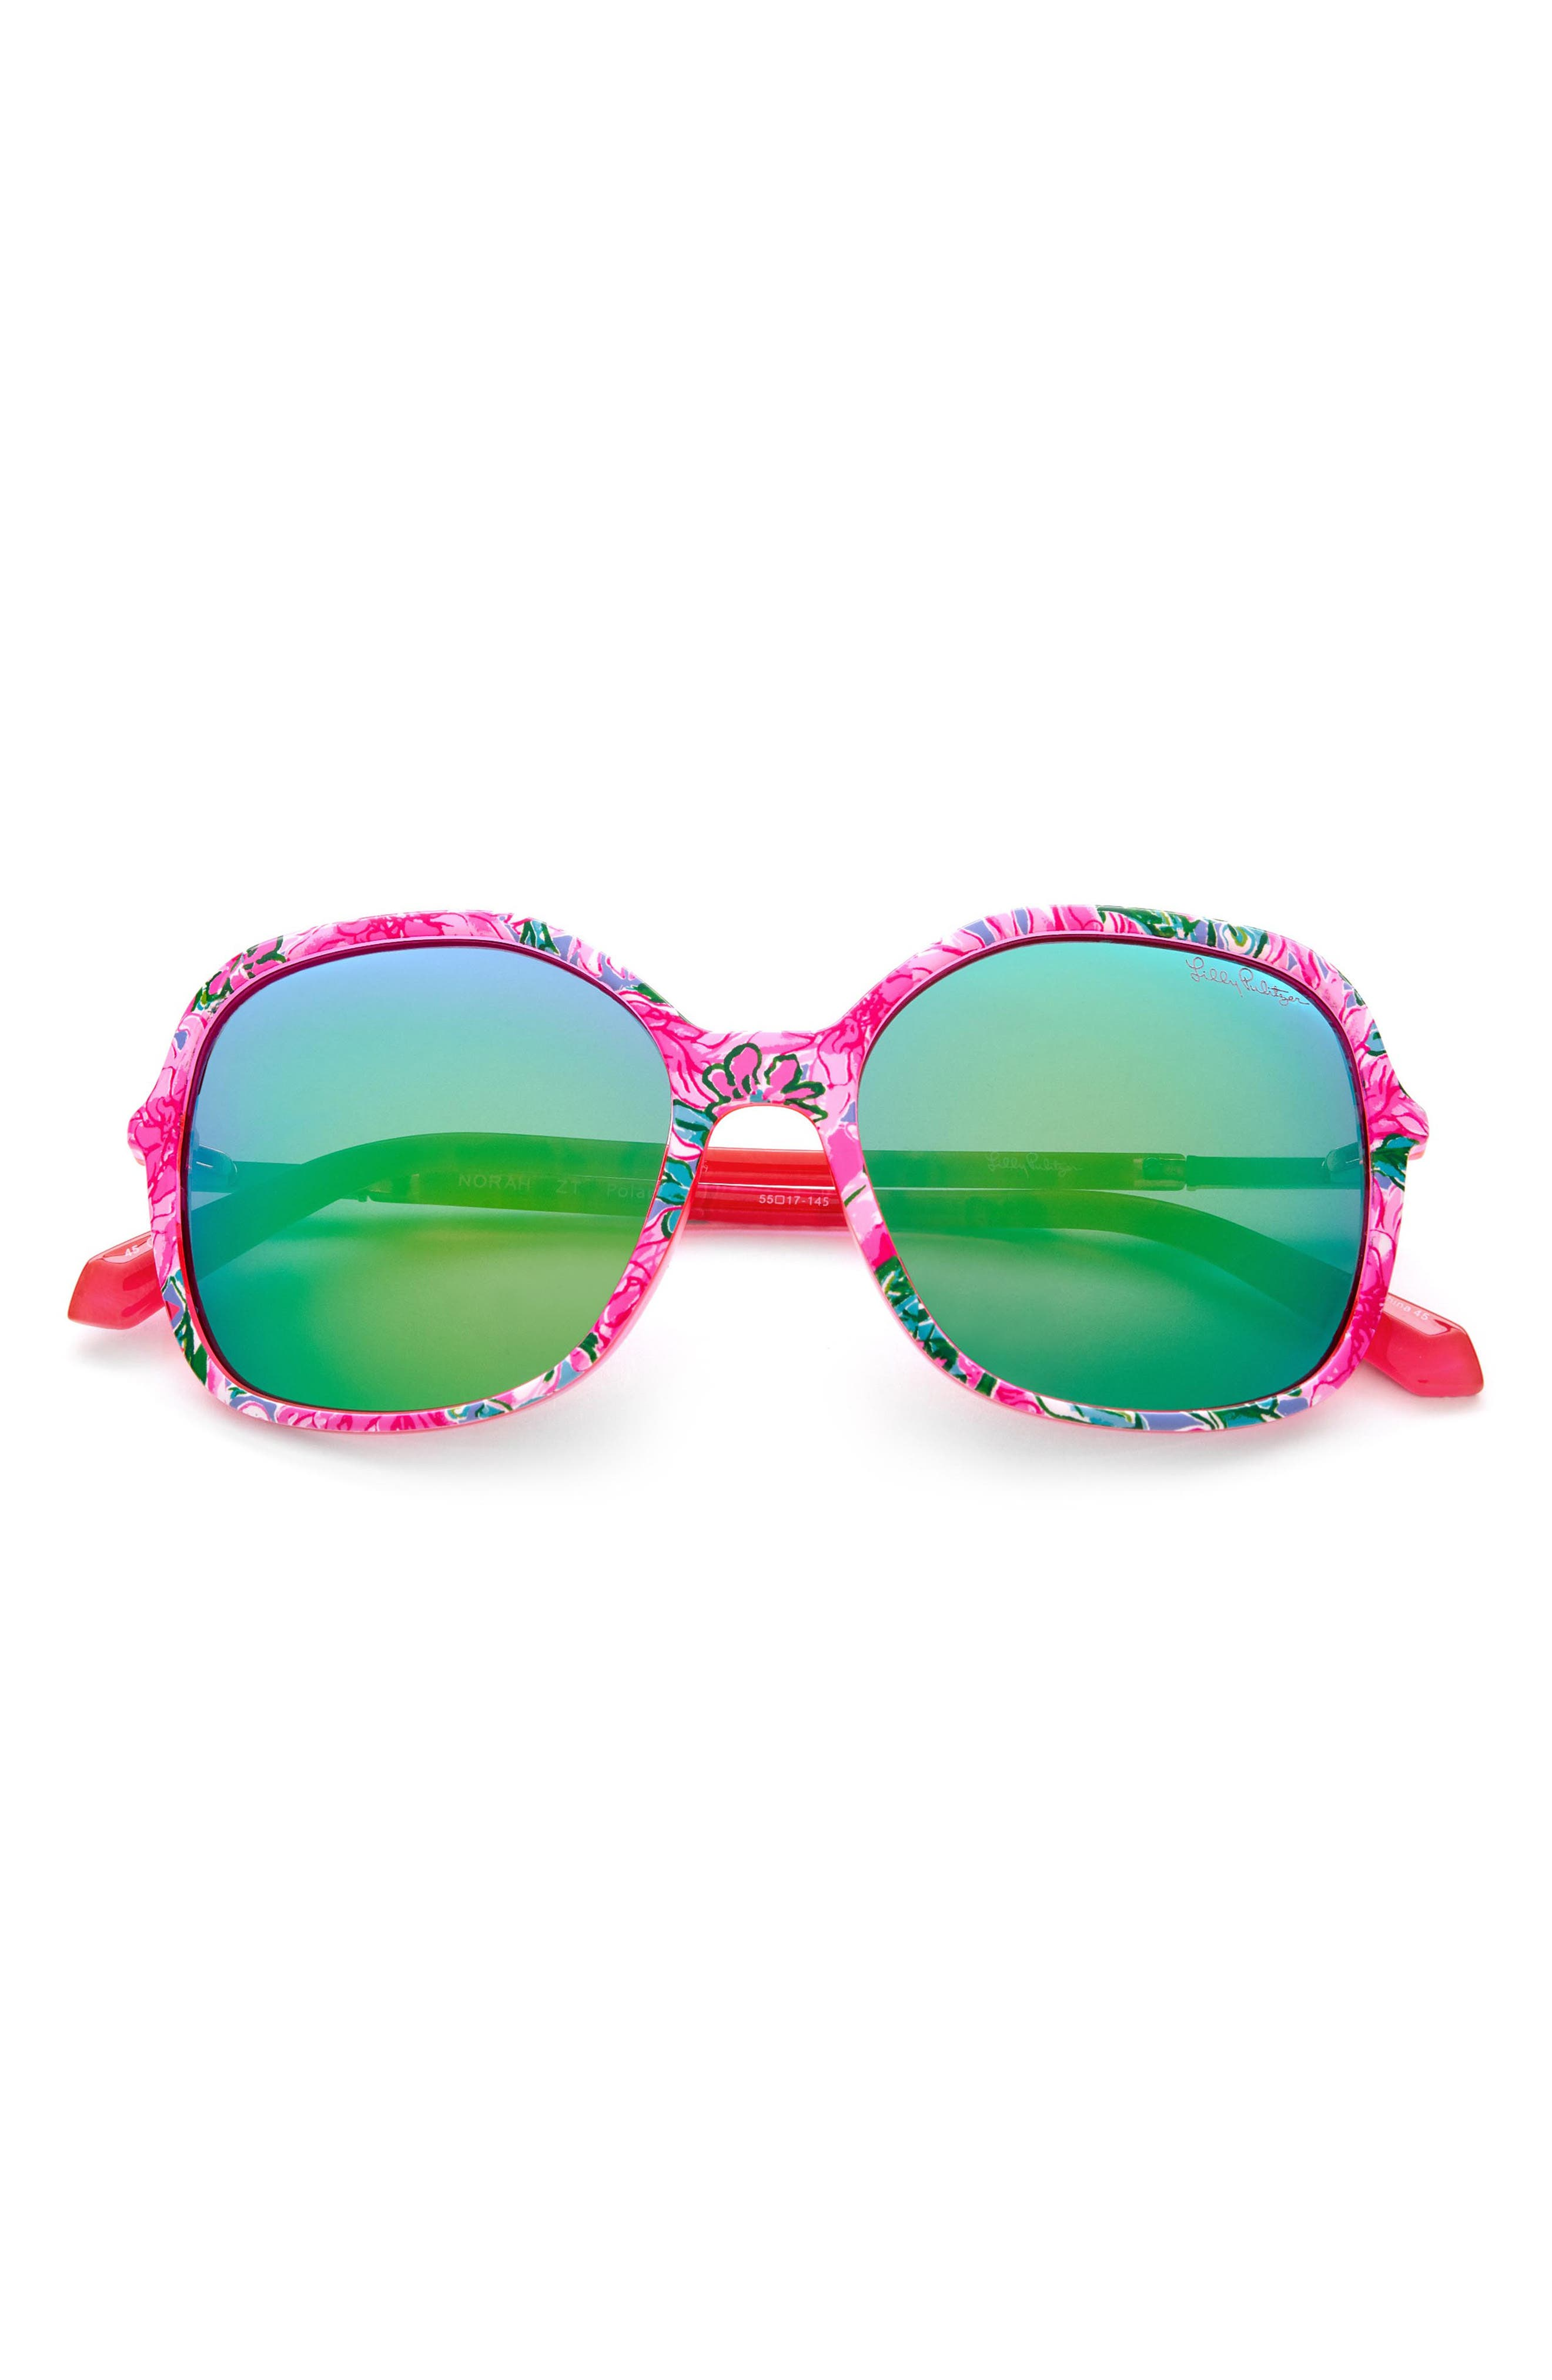 Women's Lilly Pulitzer 55mm Oversized Sunglasses